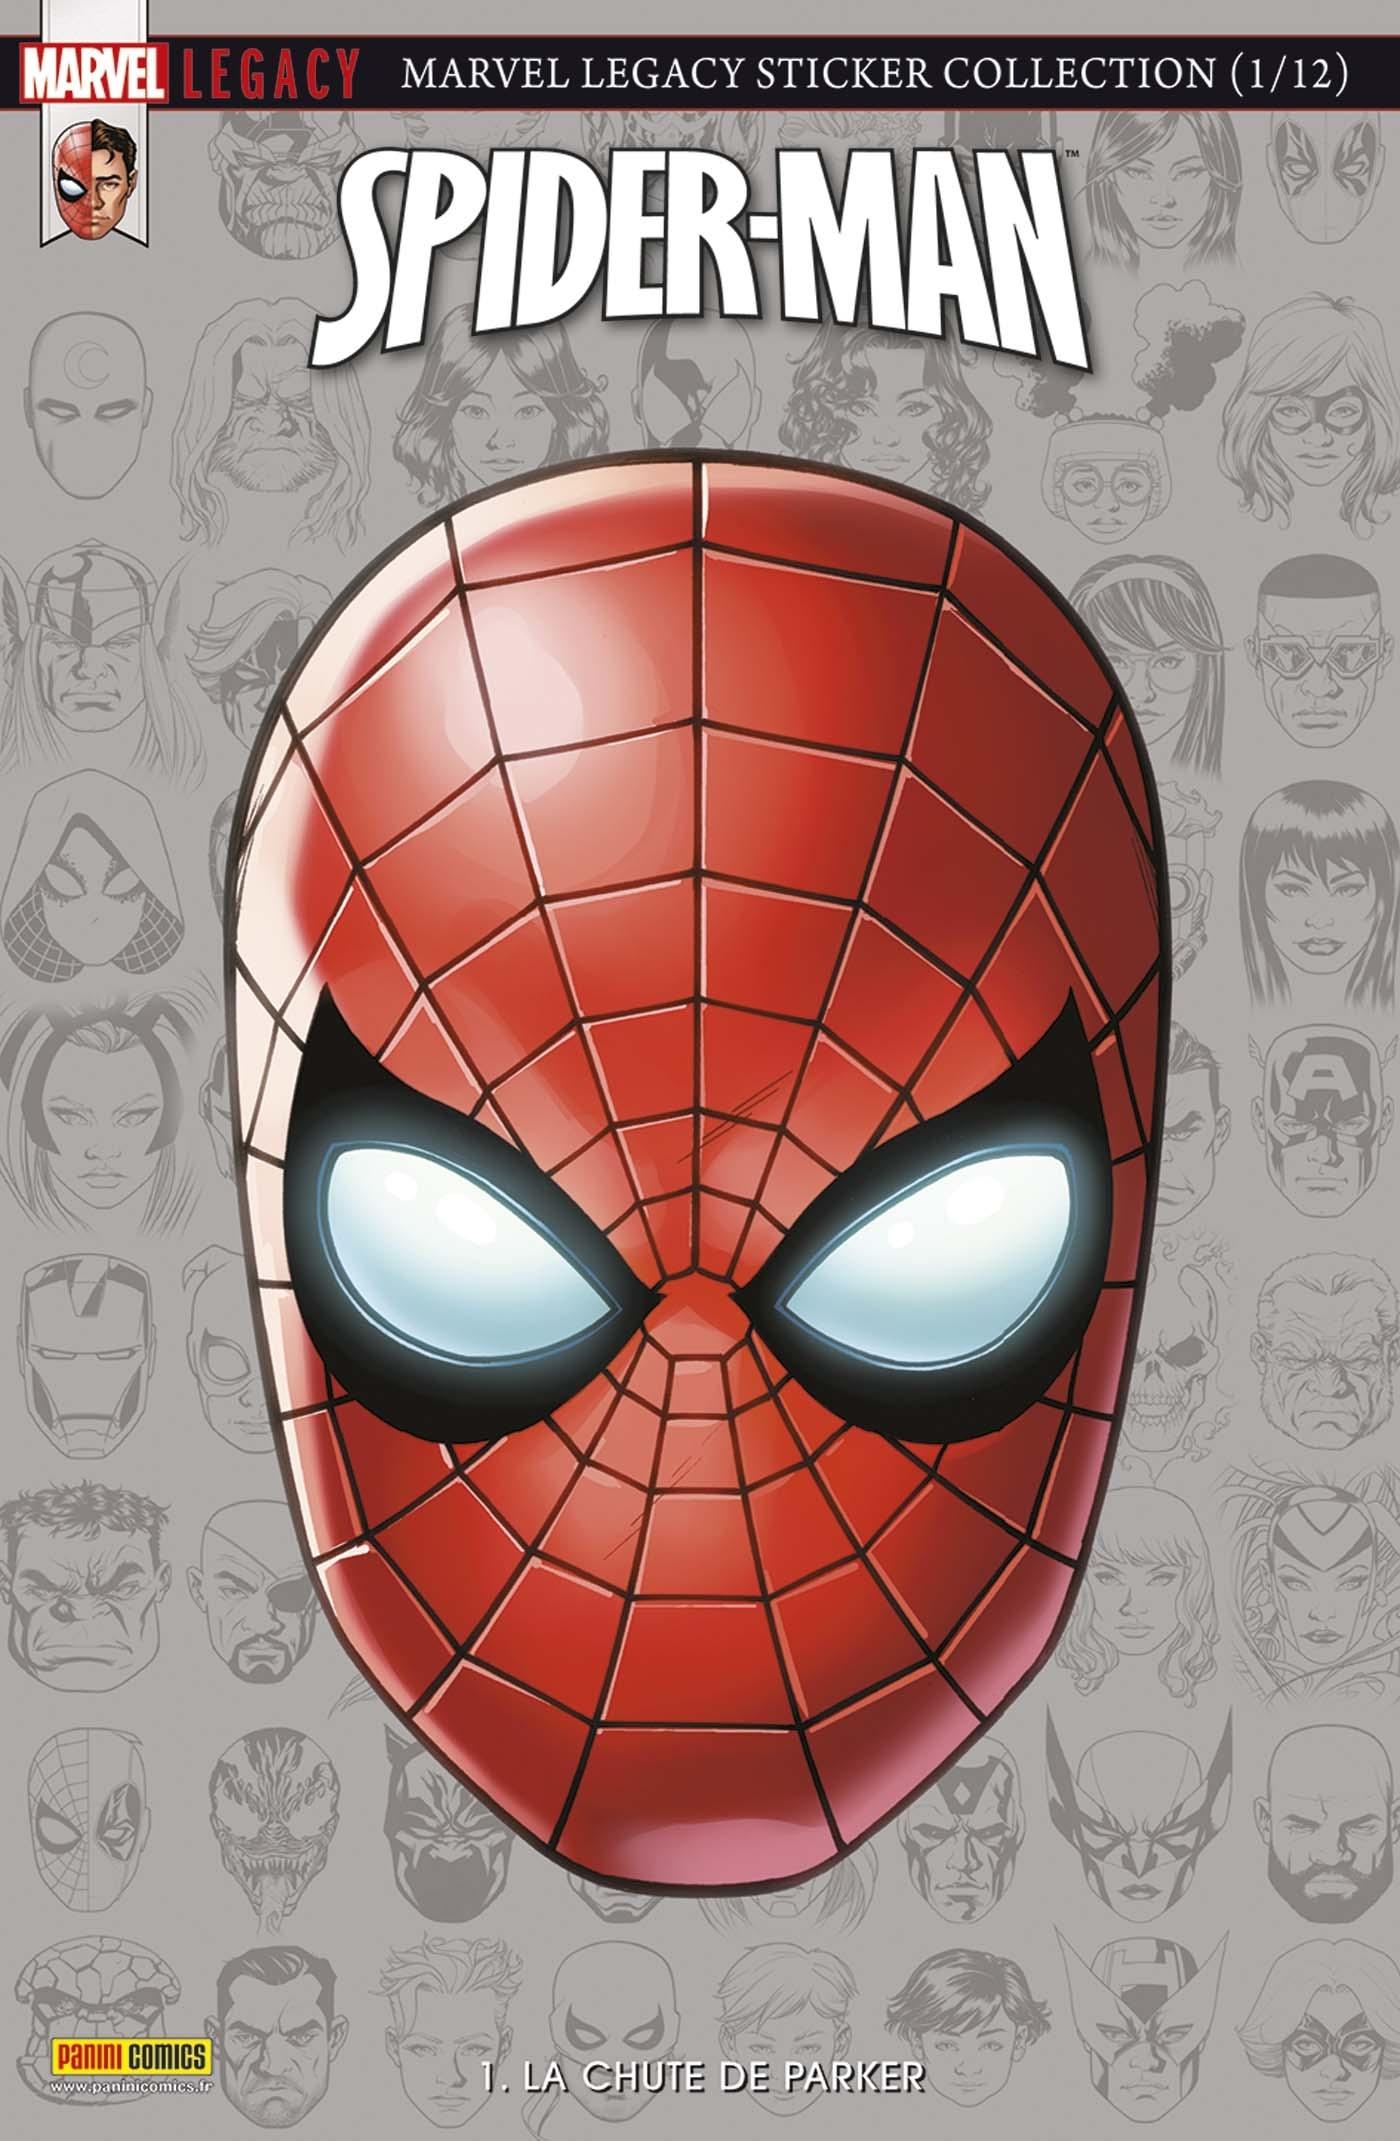 MARVEL LEGACY : SPIDER-MAN N 1